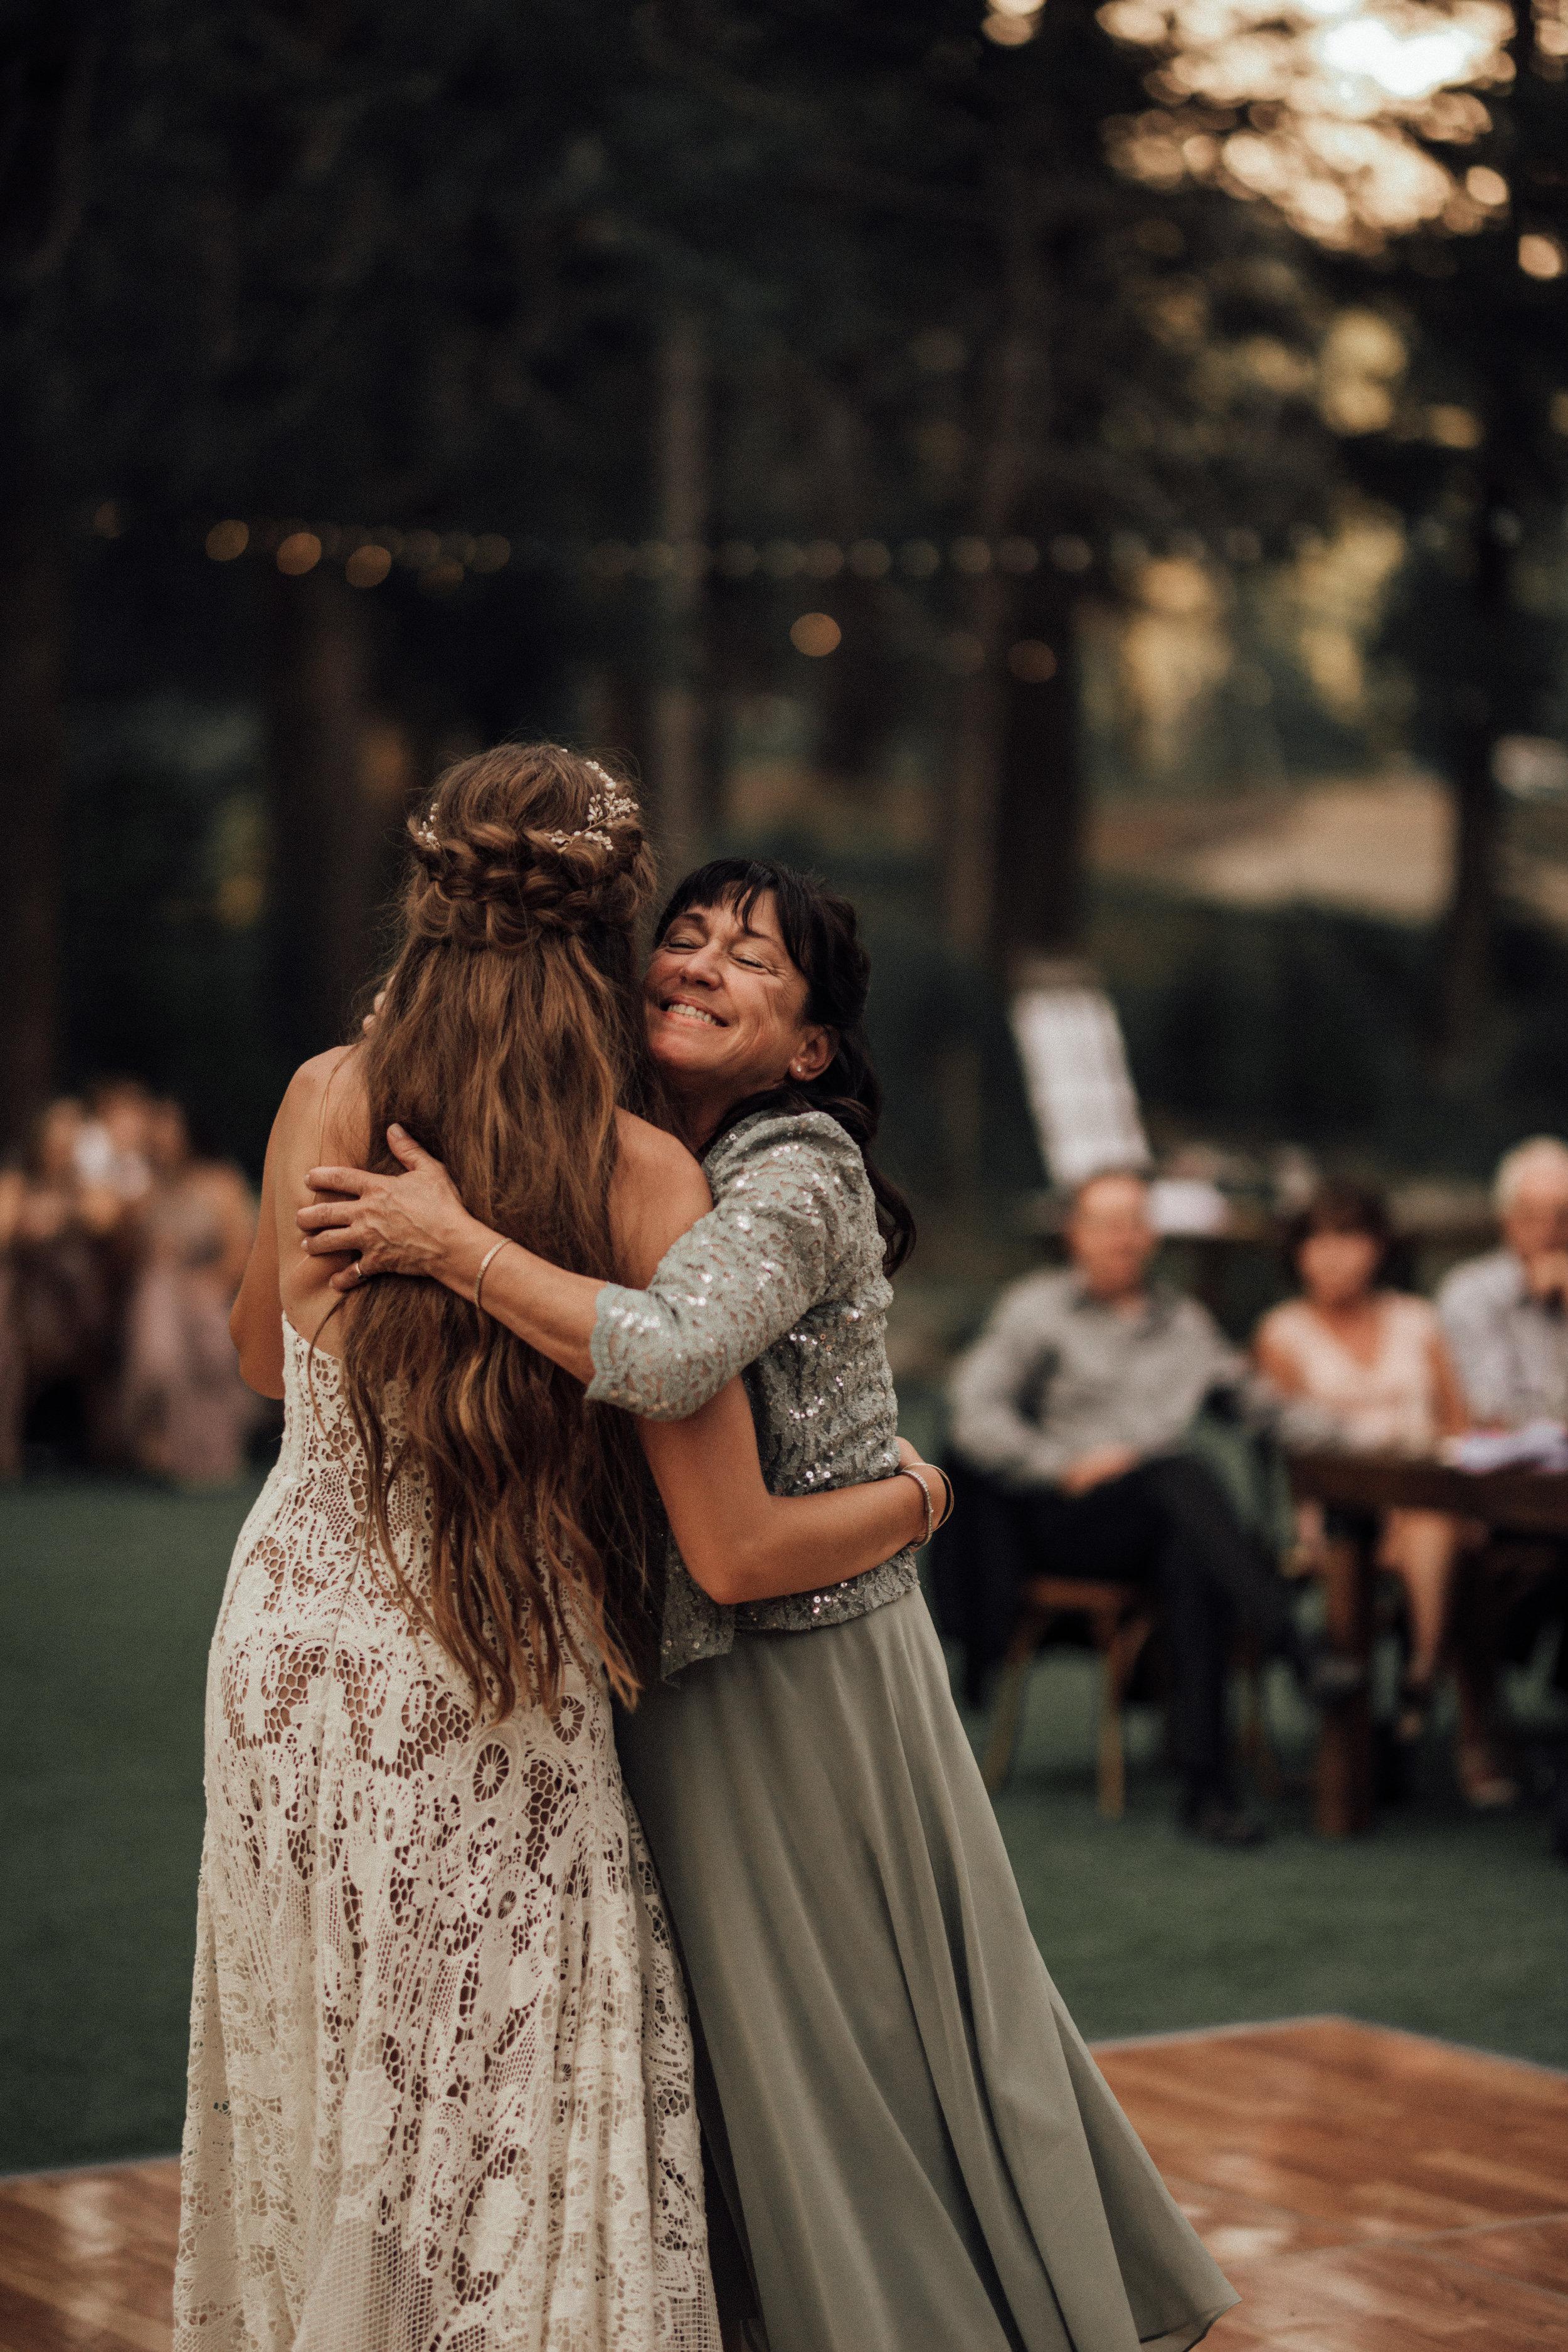 may-wedding-dancing-pines-sierraville-wedding-ca-danielle-kyle-junebug-photography-lake-tahoe-1-2246.jpg